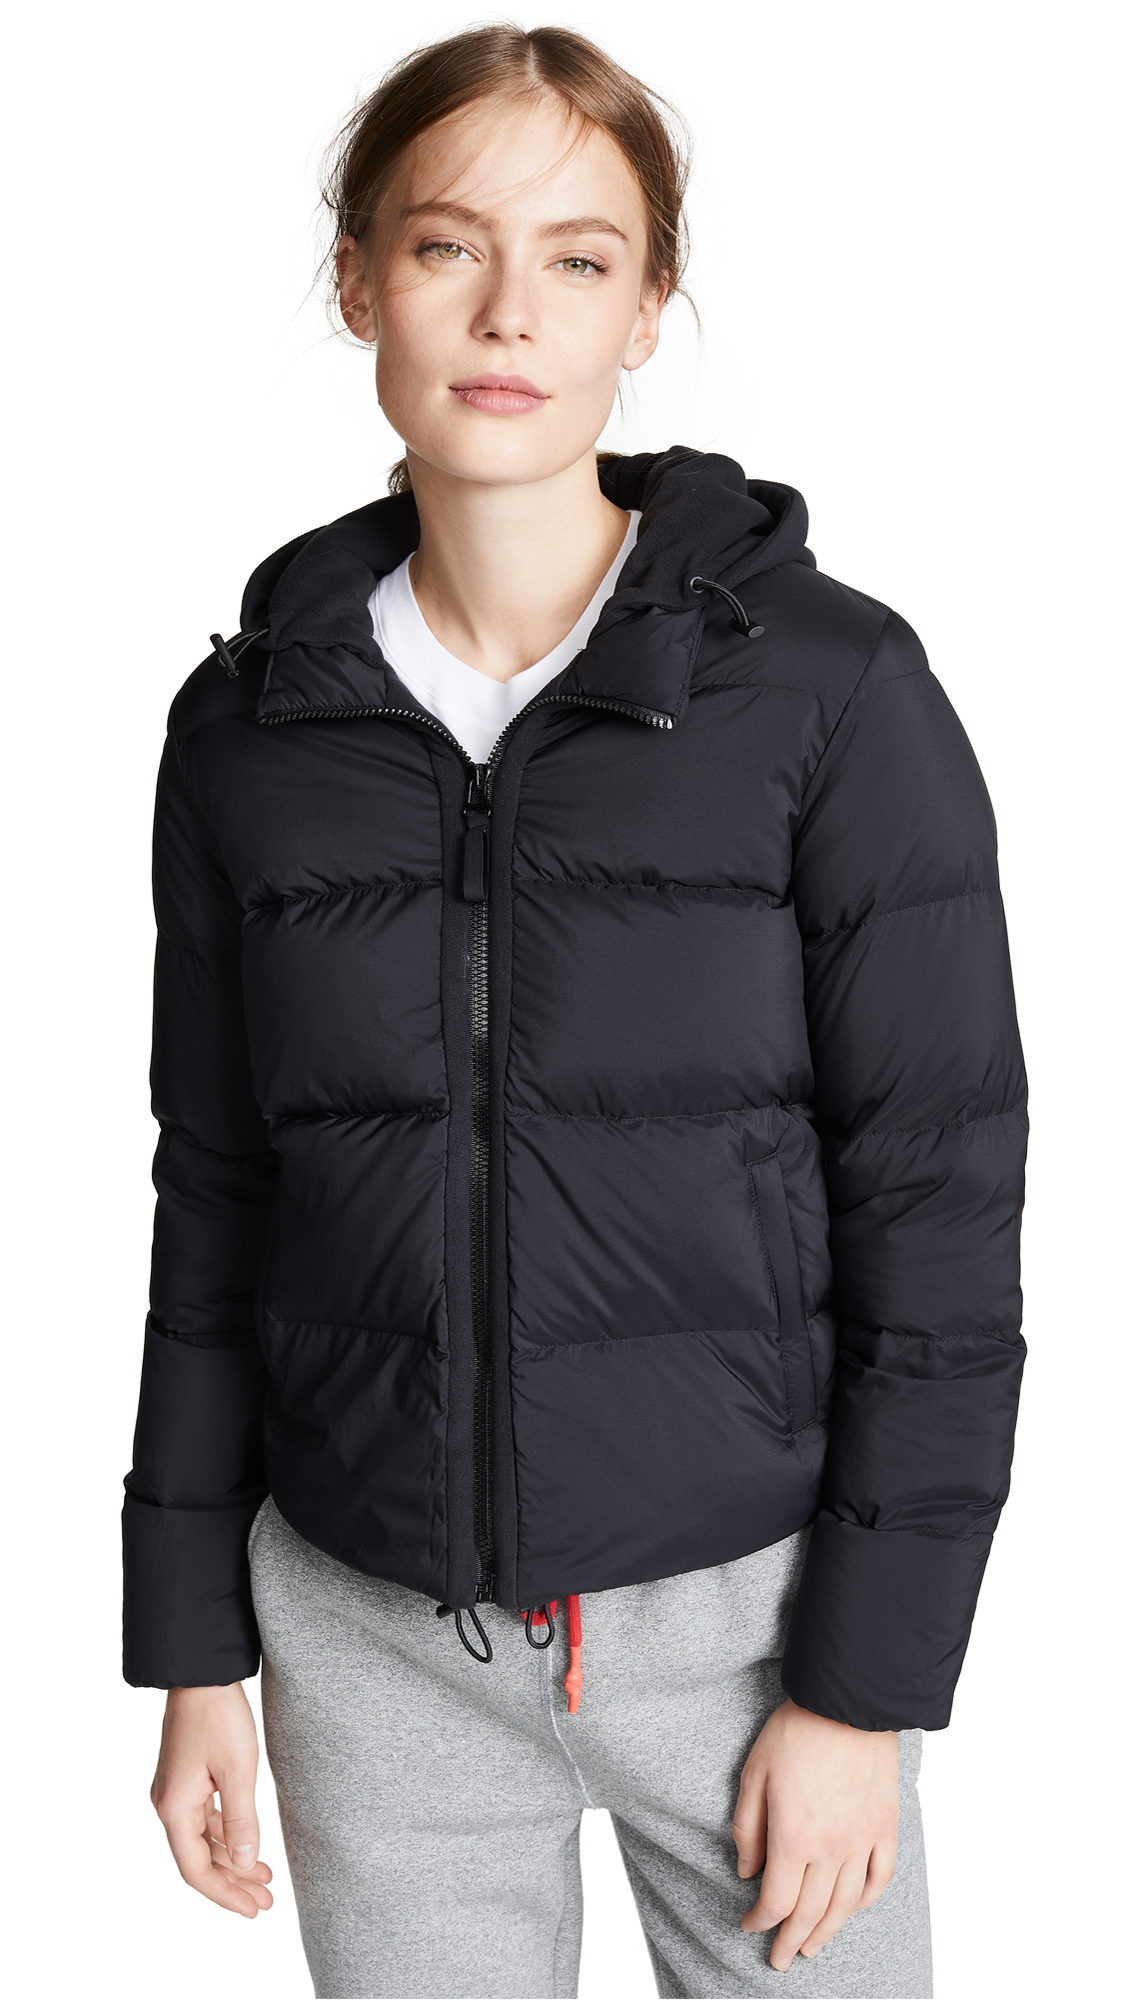 JAMES PERSE Fleece Lined Puffer Jacket in Black